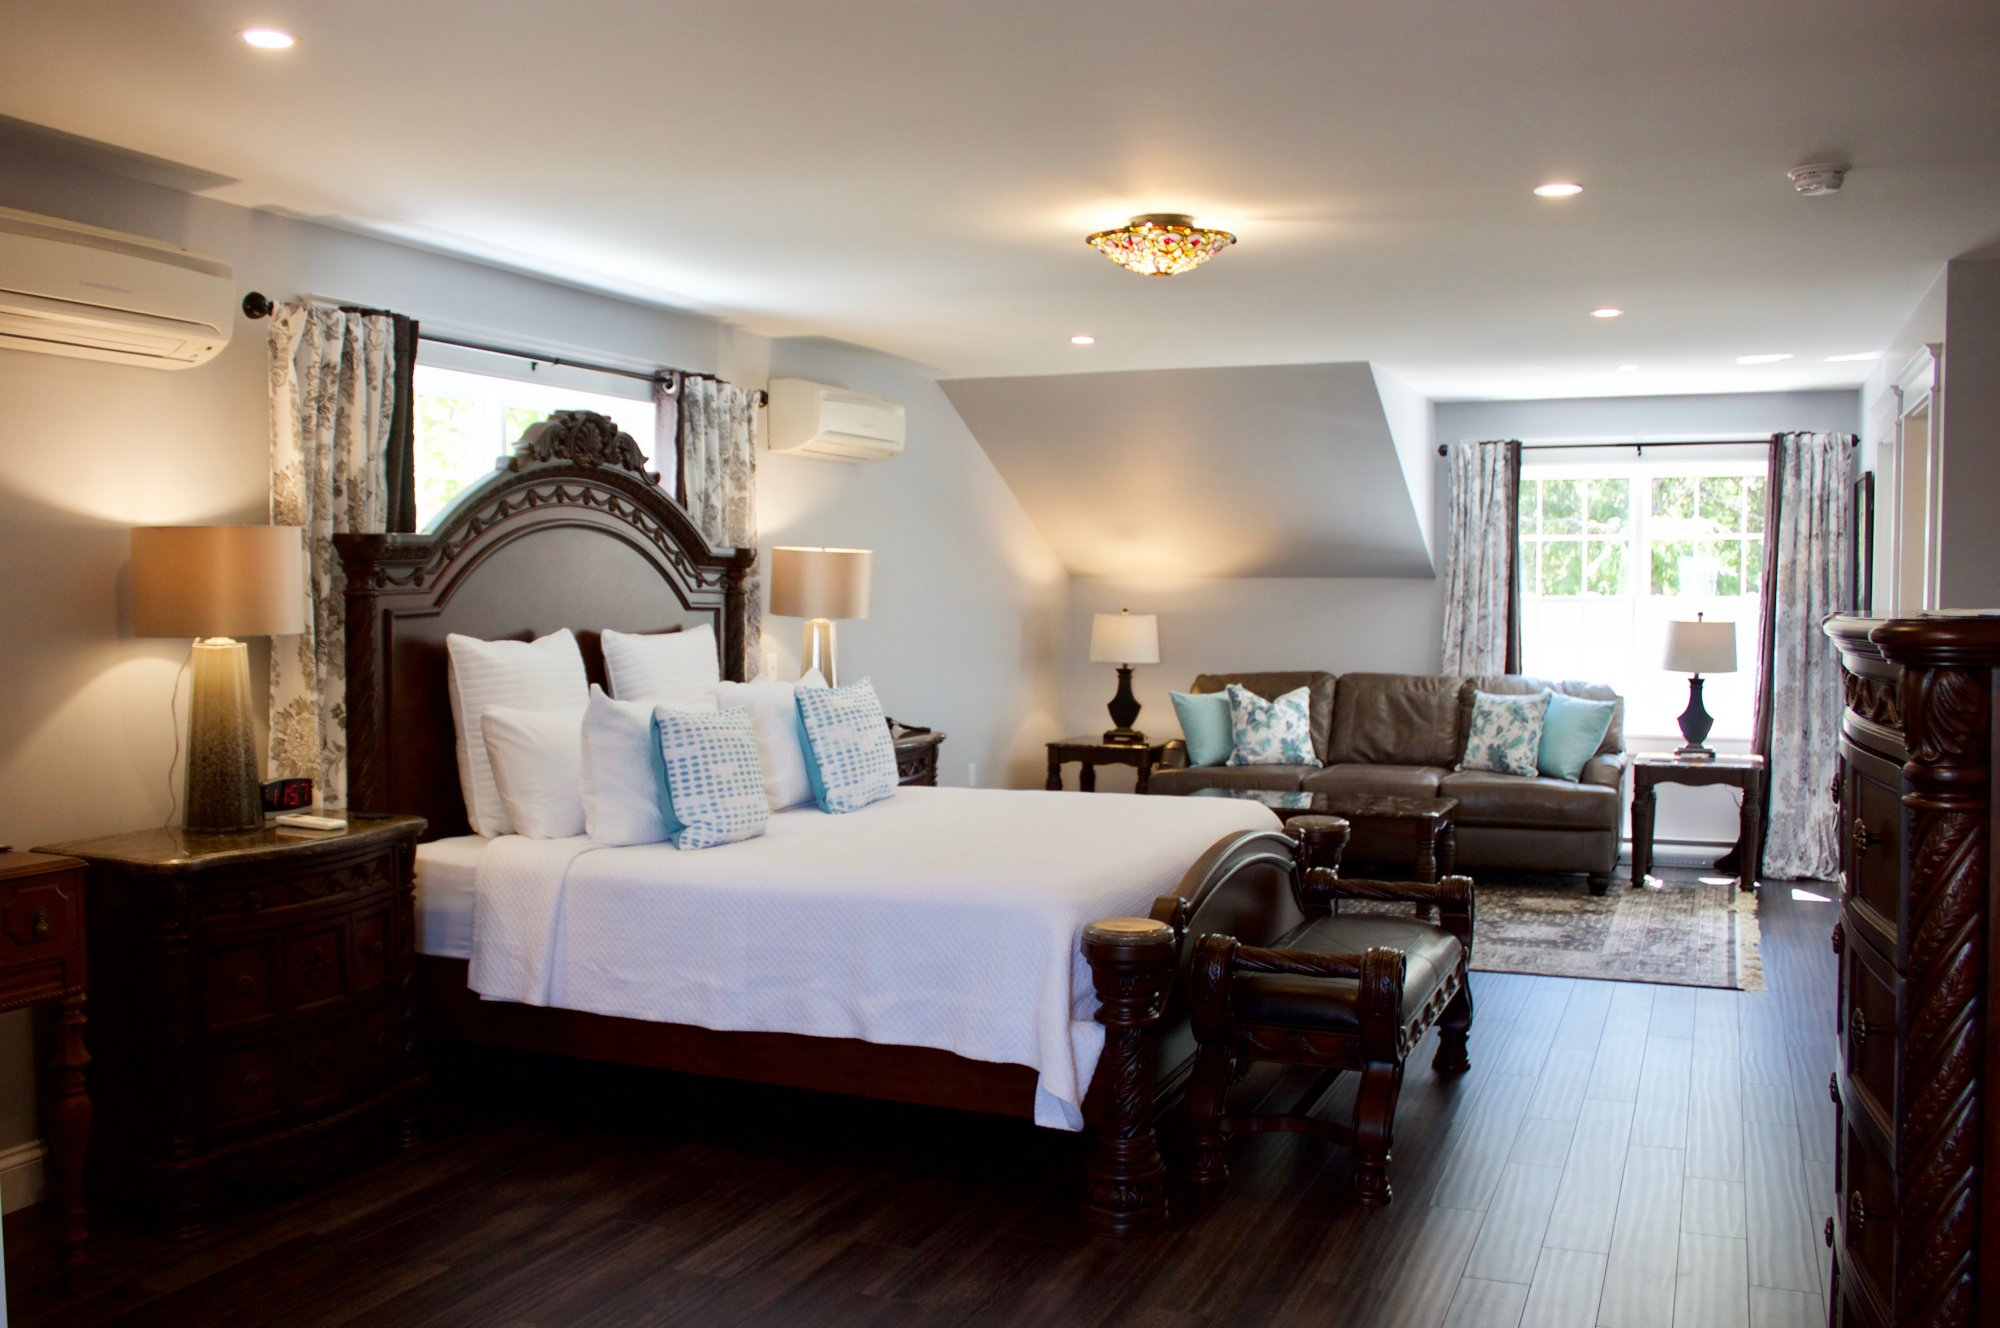 The Harwood Suite at Tattingstone Inn